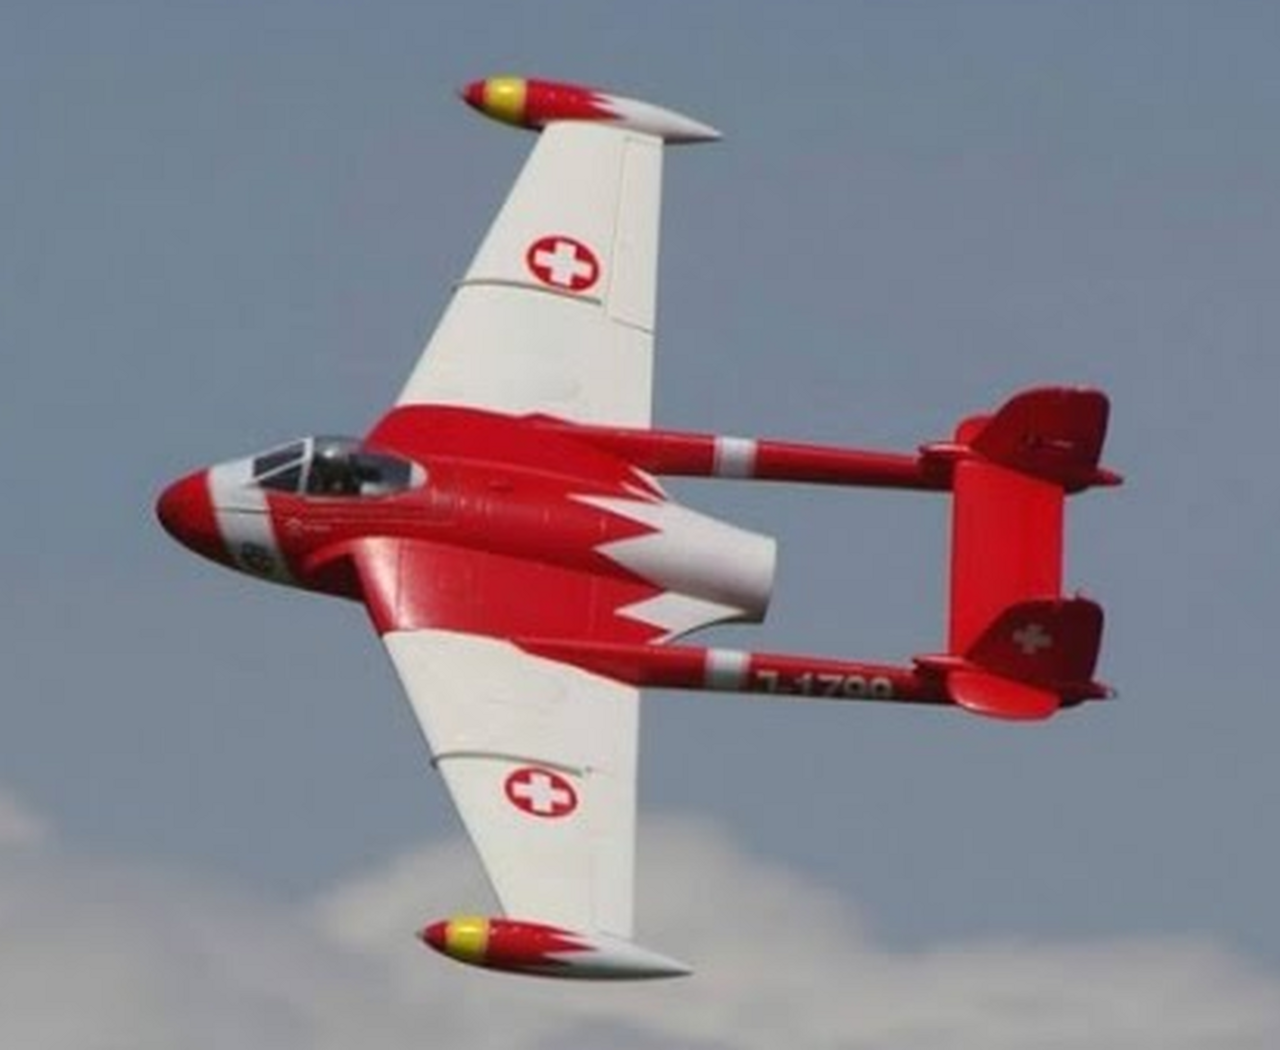 Freewing - De Havilland DH-112 Venom 90mm EDF Jet Version 2- Swiss Red PNP